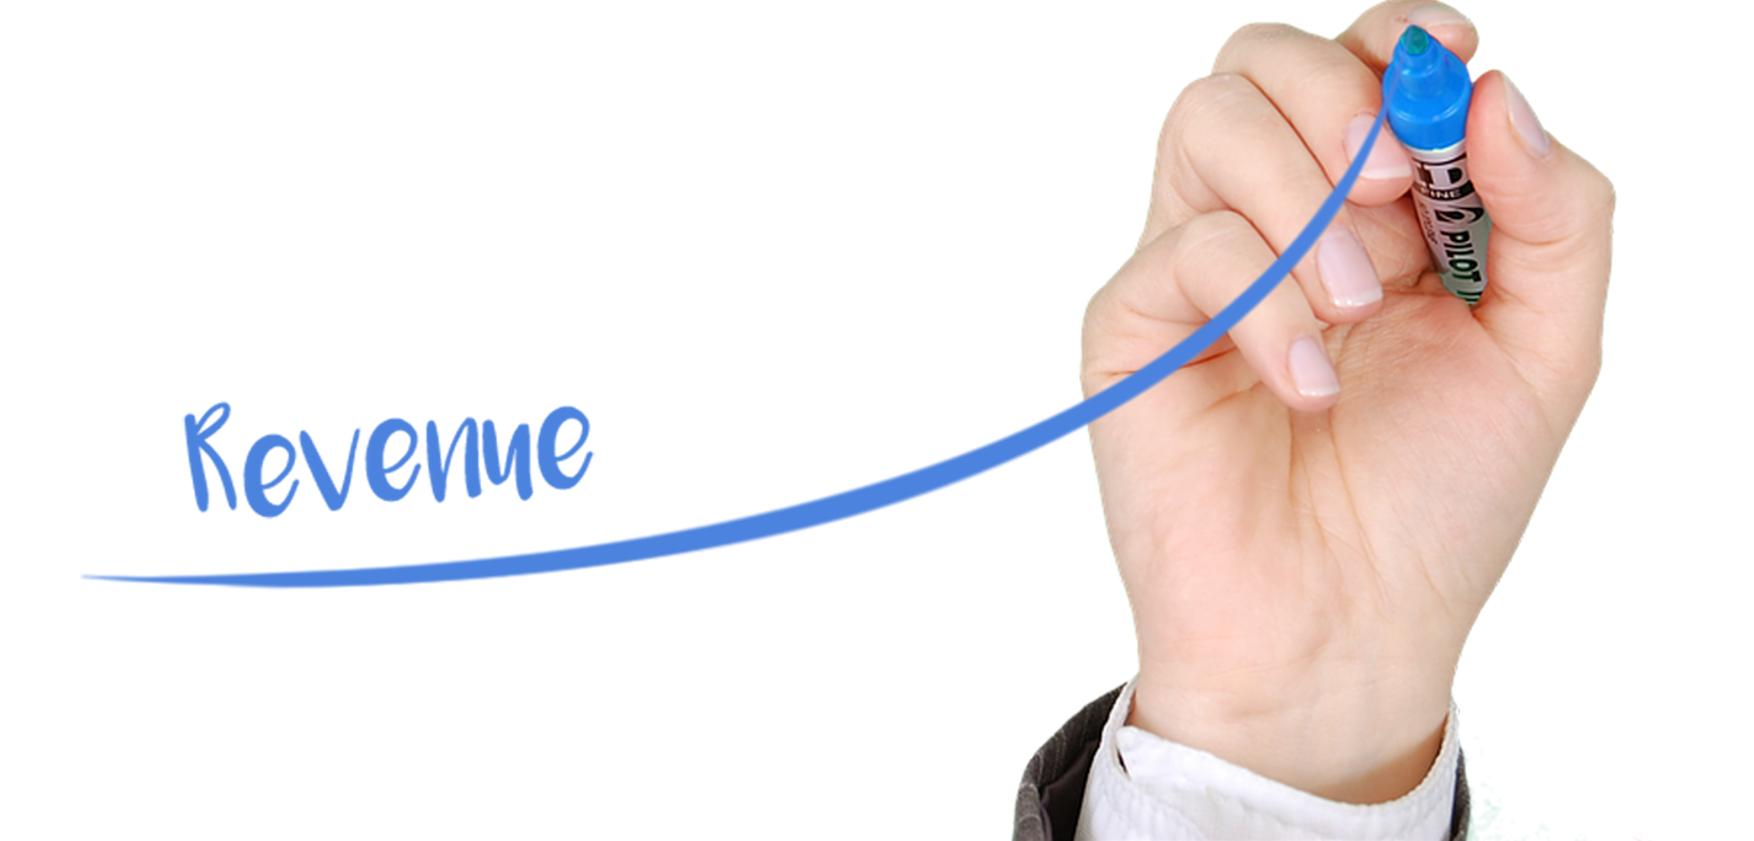 Qué es el MRR: Monthly Recurring Revenue